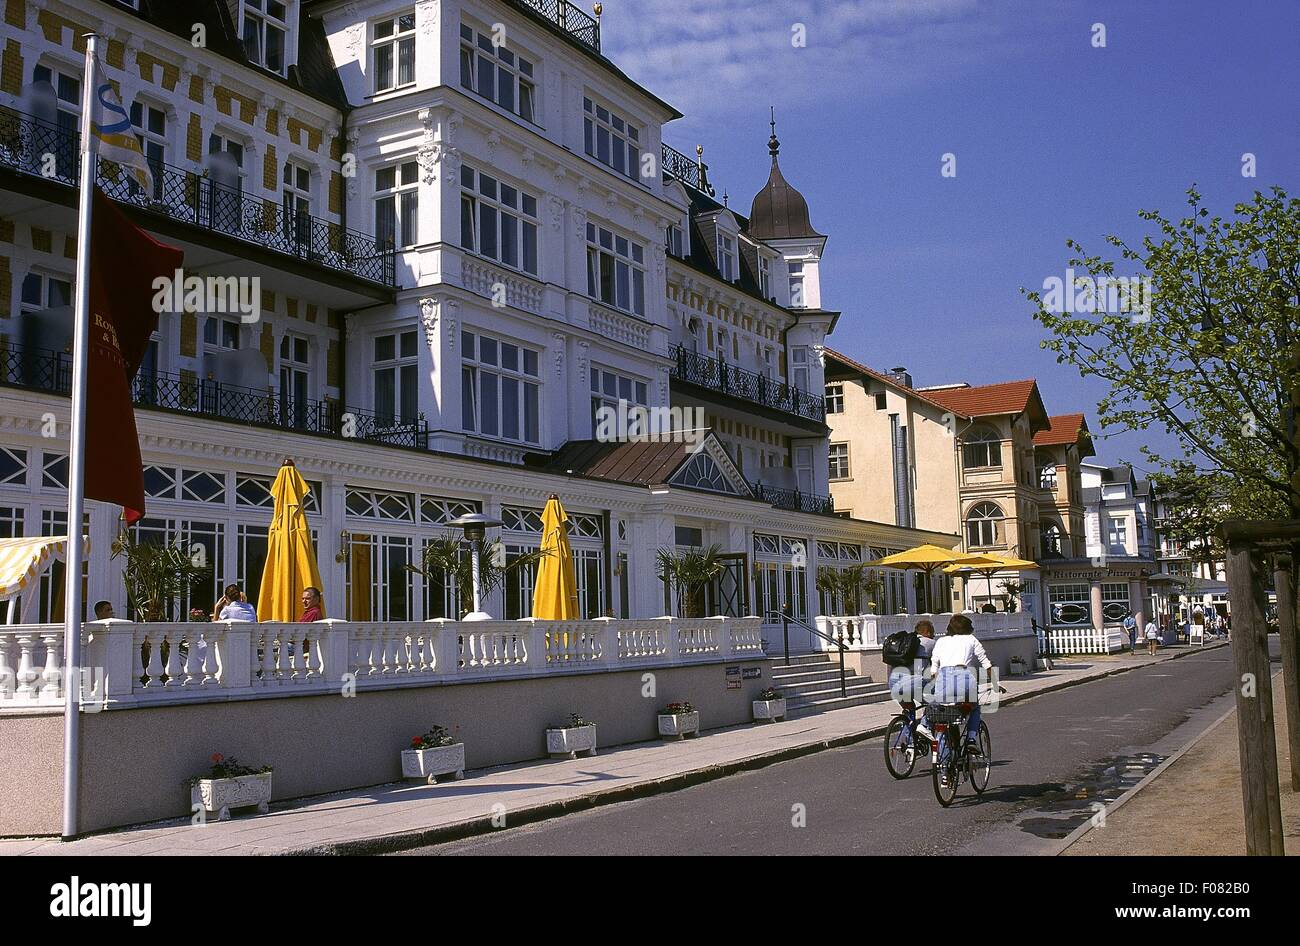 Fassade des Seetel Romantik Seehotel Ahlbecker Hof auf Usedom Promenade, Deutschland Stockbild